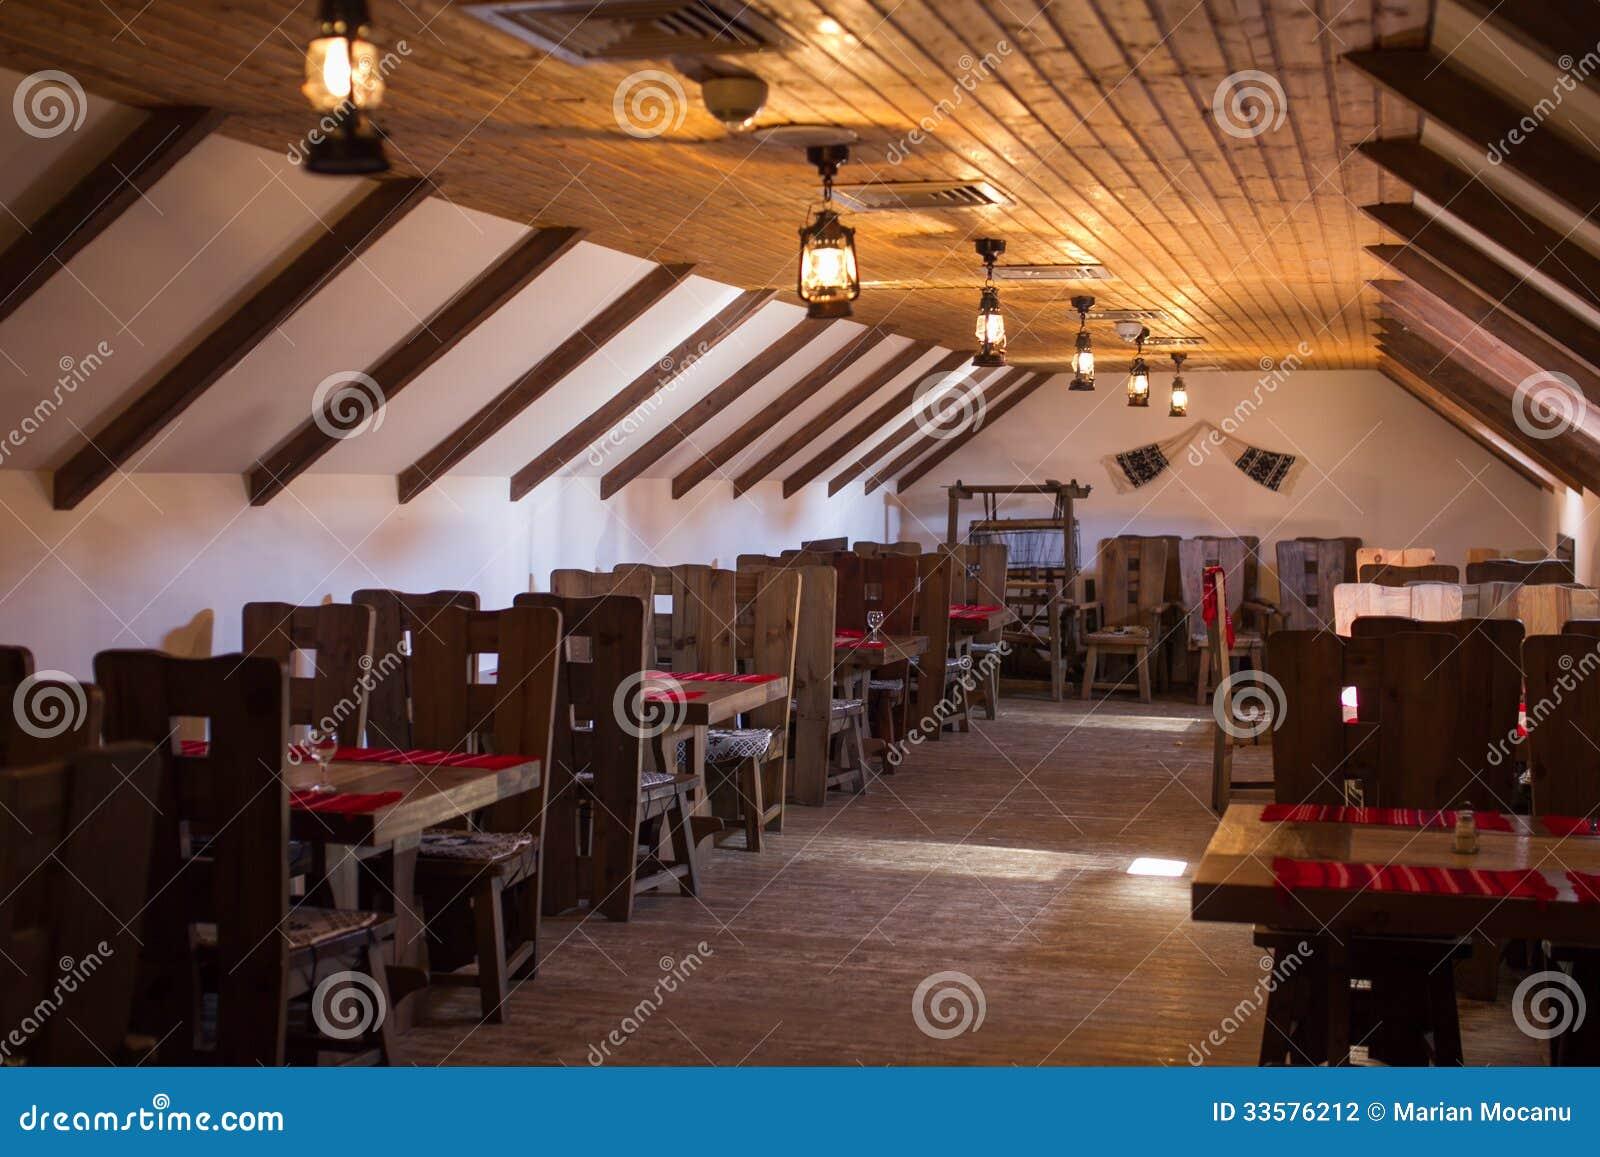 Terraza r stica fotograf a de archivo imagen 33576212 - Terrazas rusticas ...